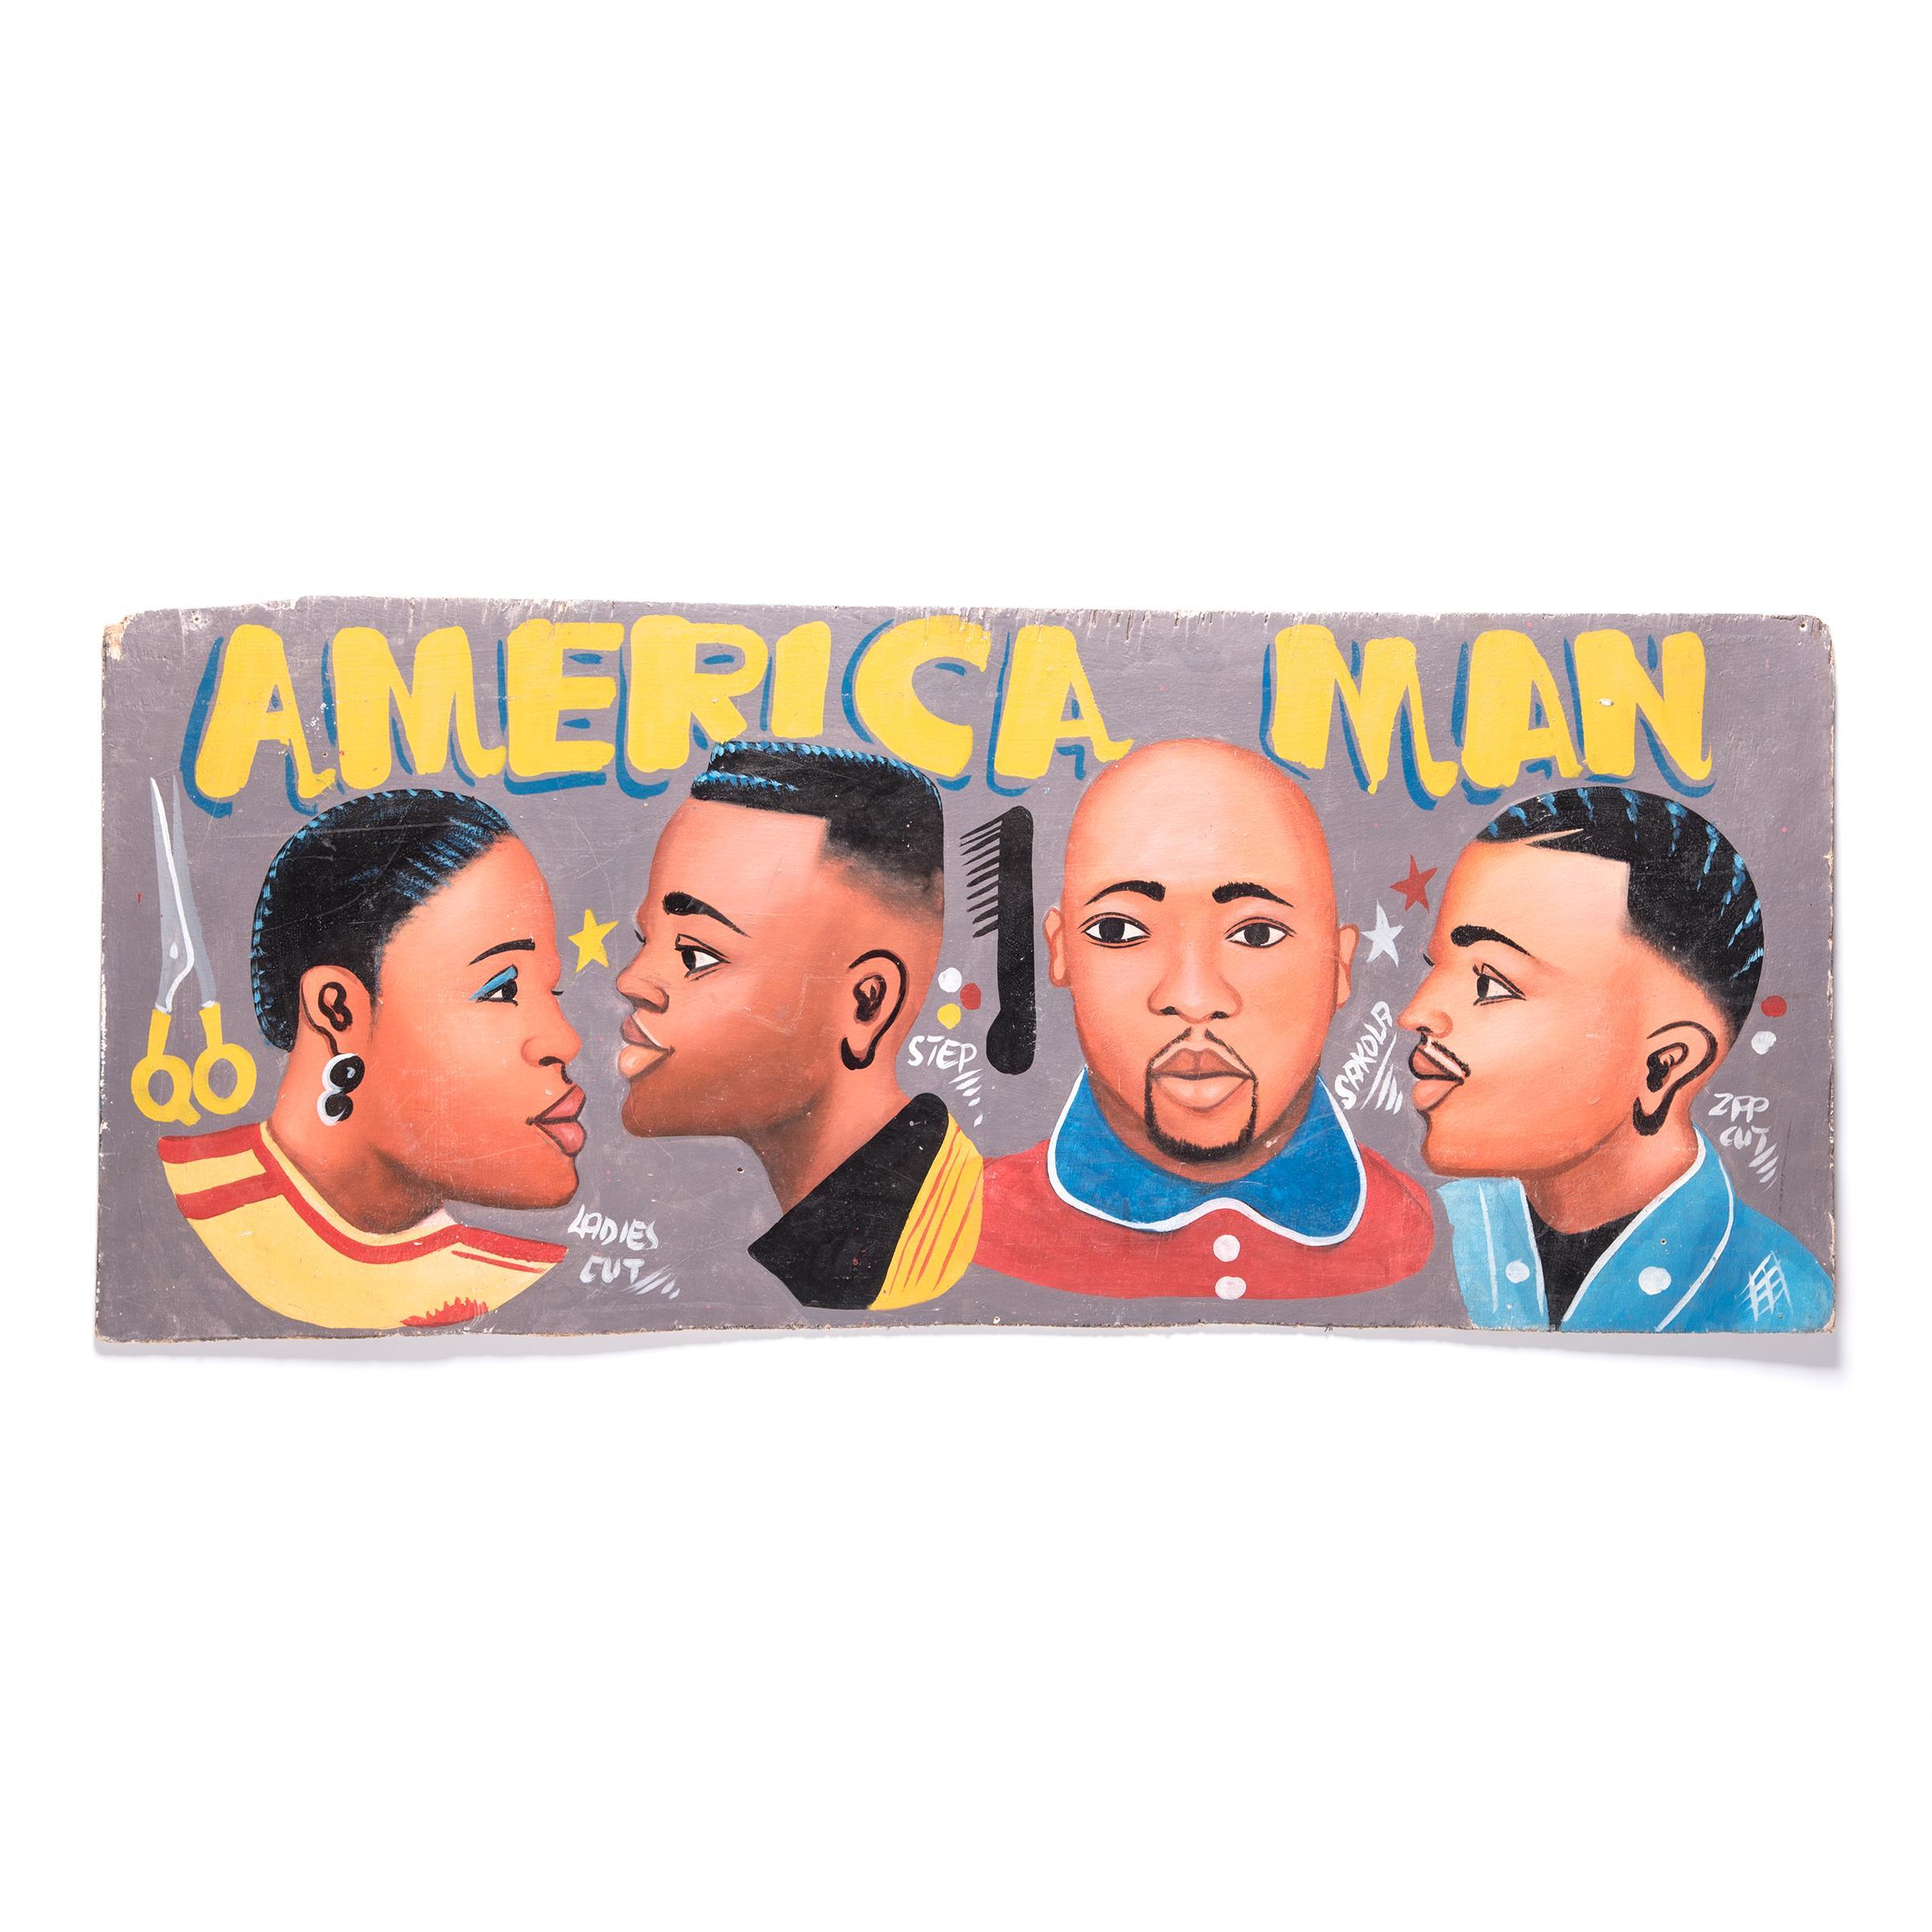 America Man